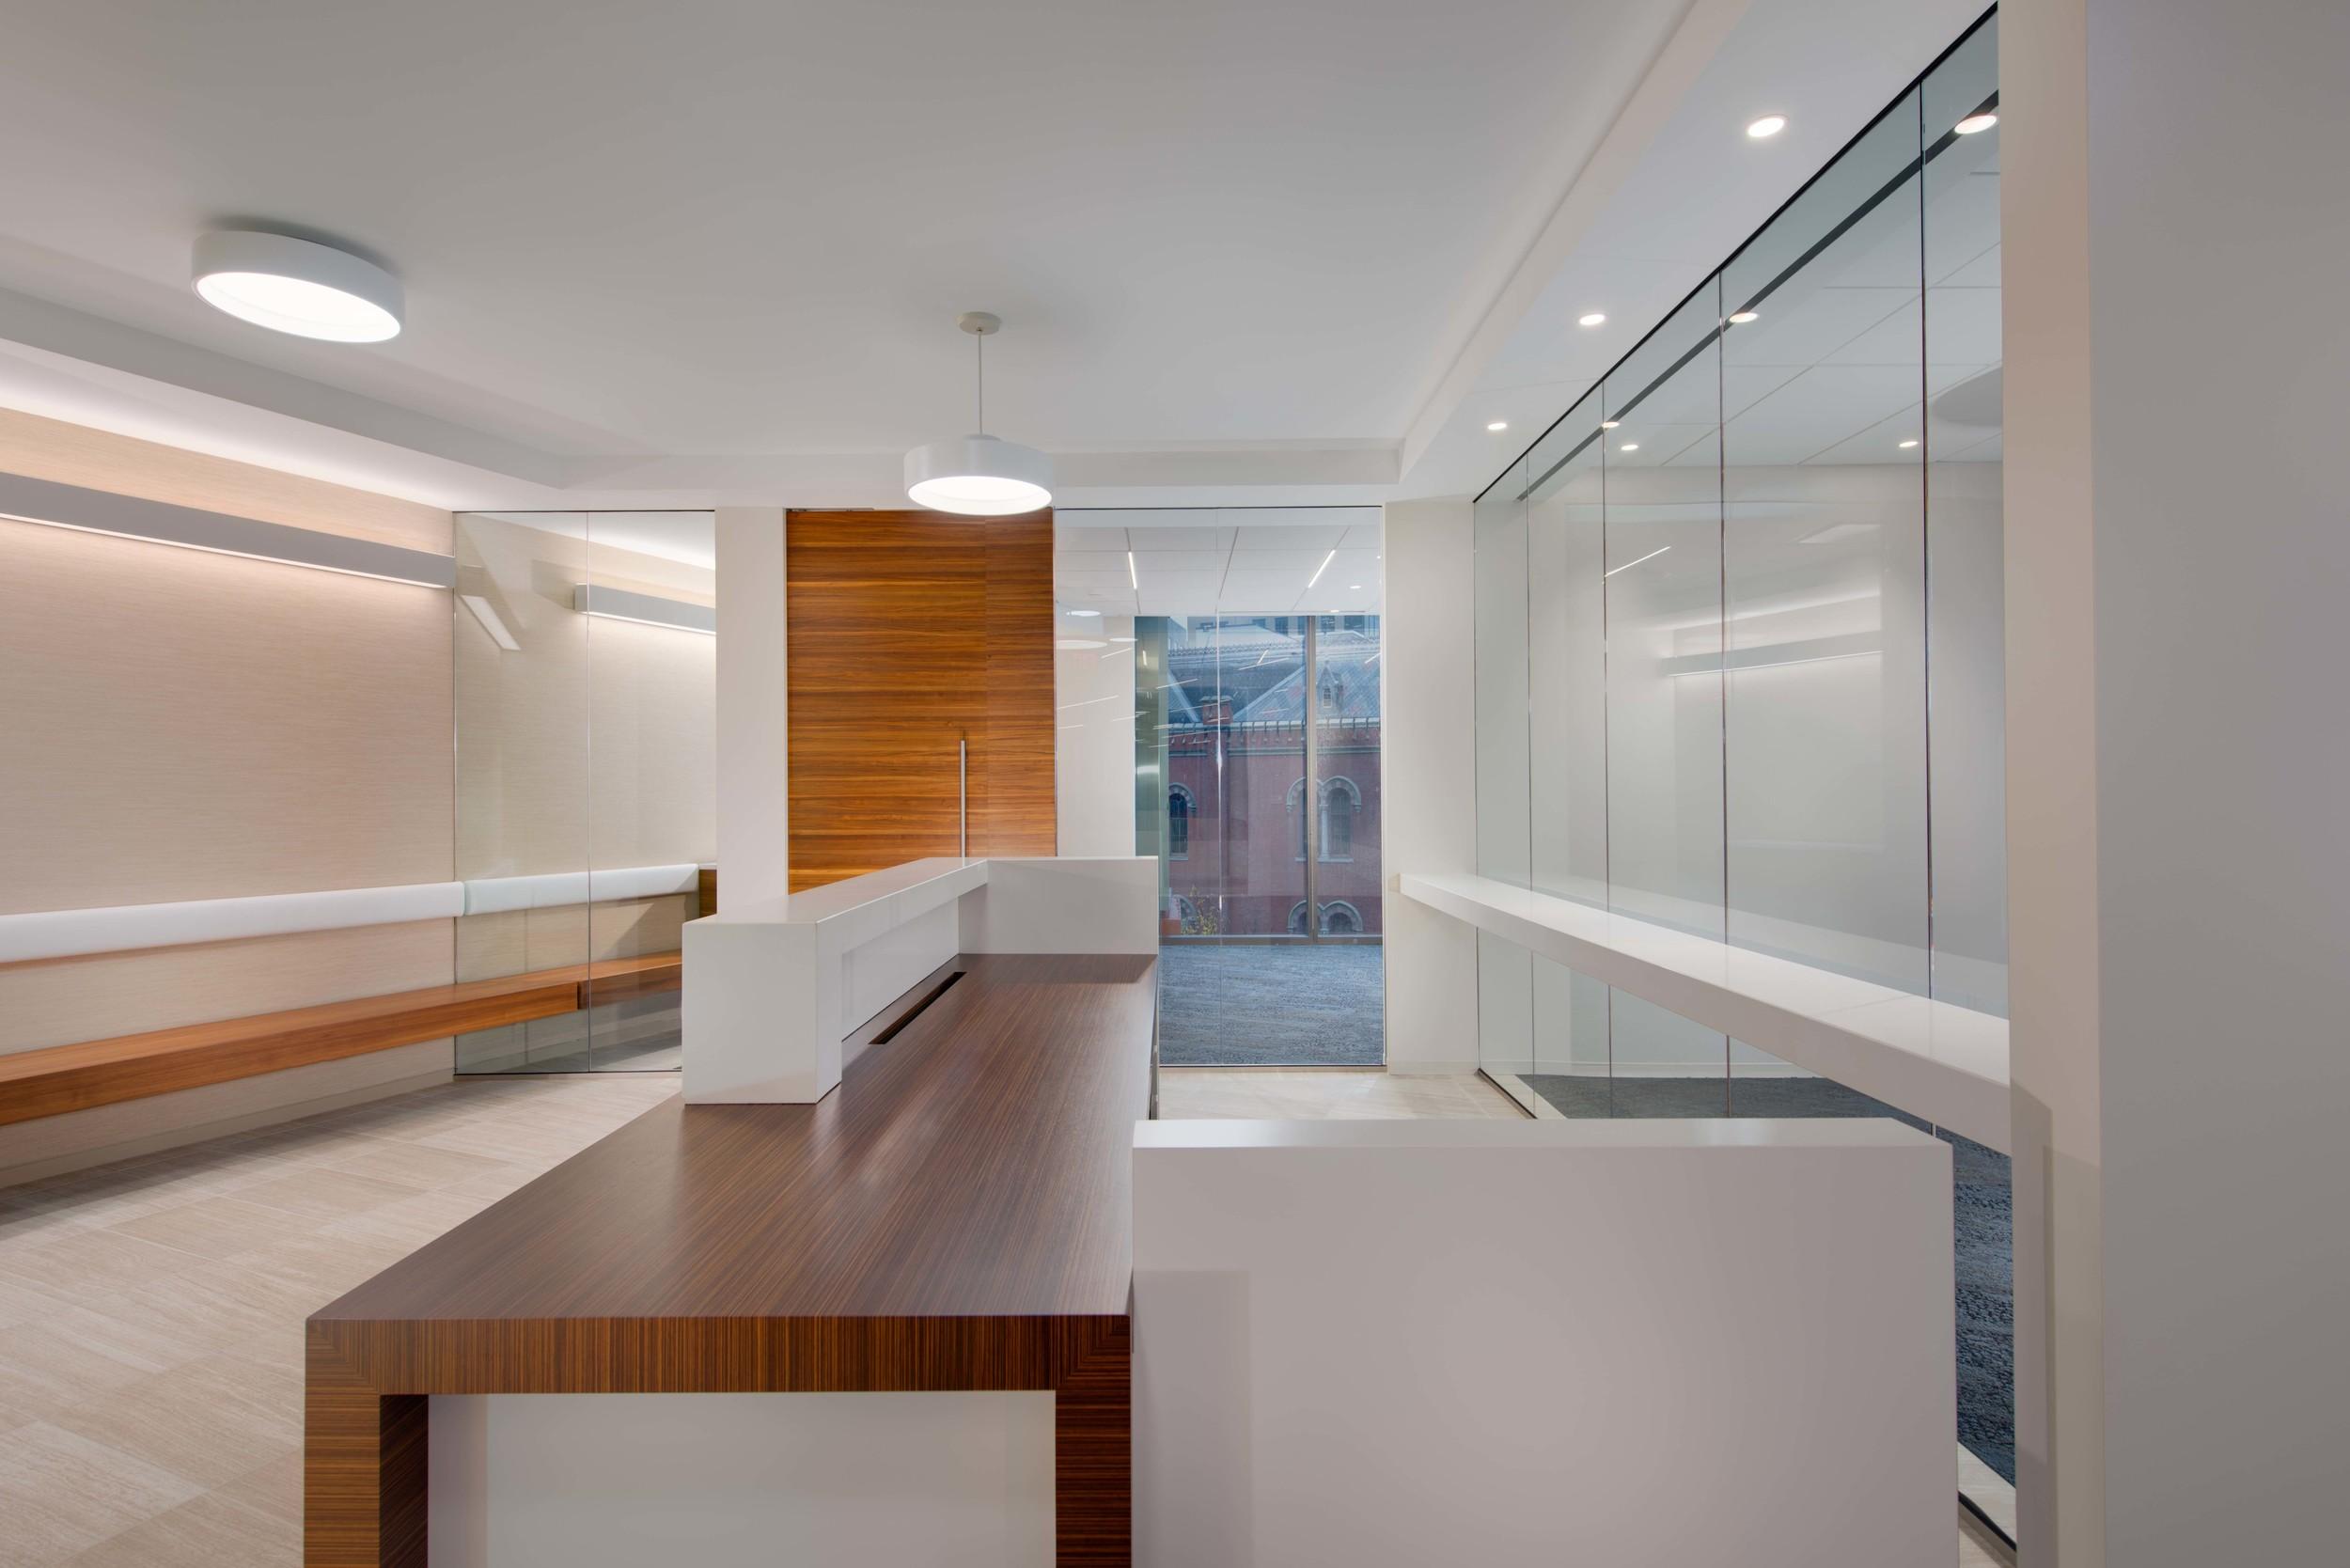 1200 17th Office Suite Interior Image 216305.jpg